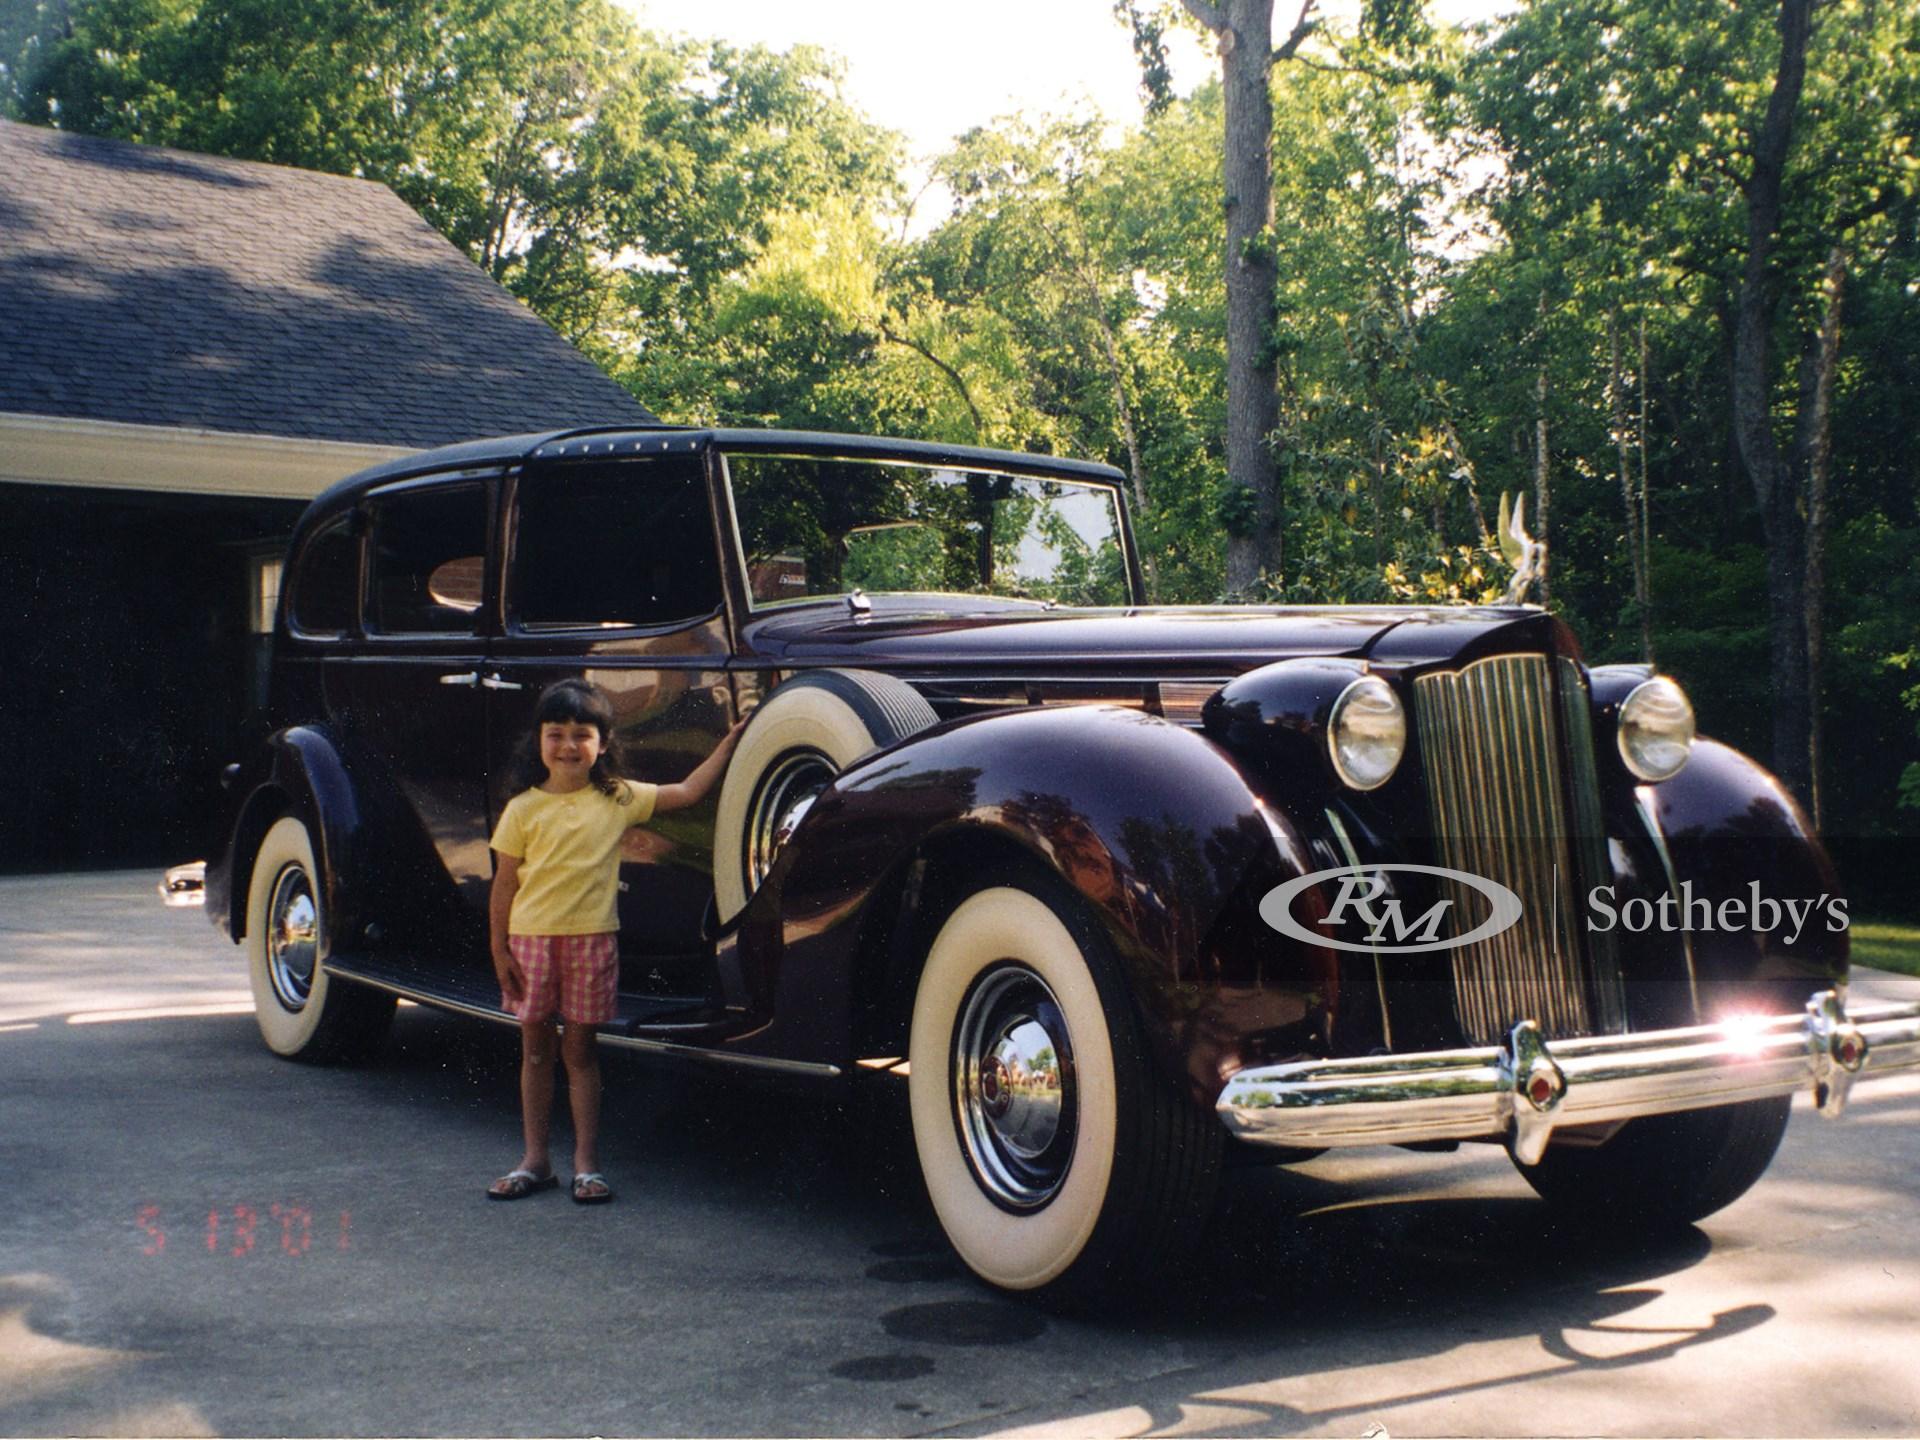 1938 Packard Twelve Town Cabriolet